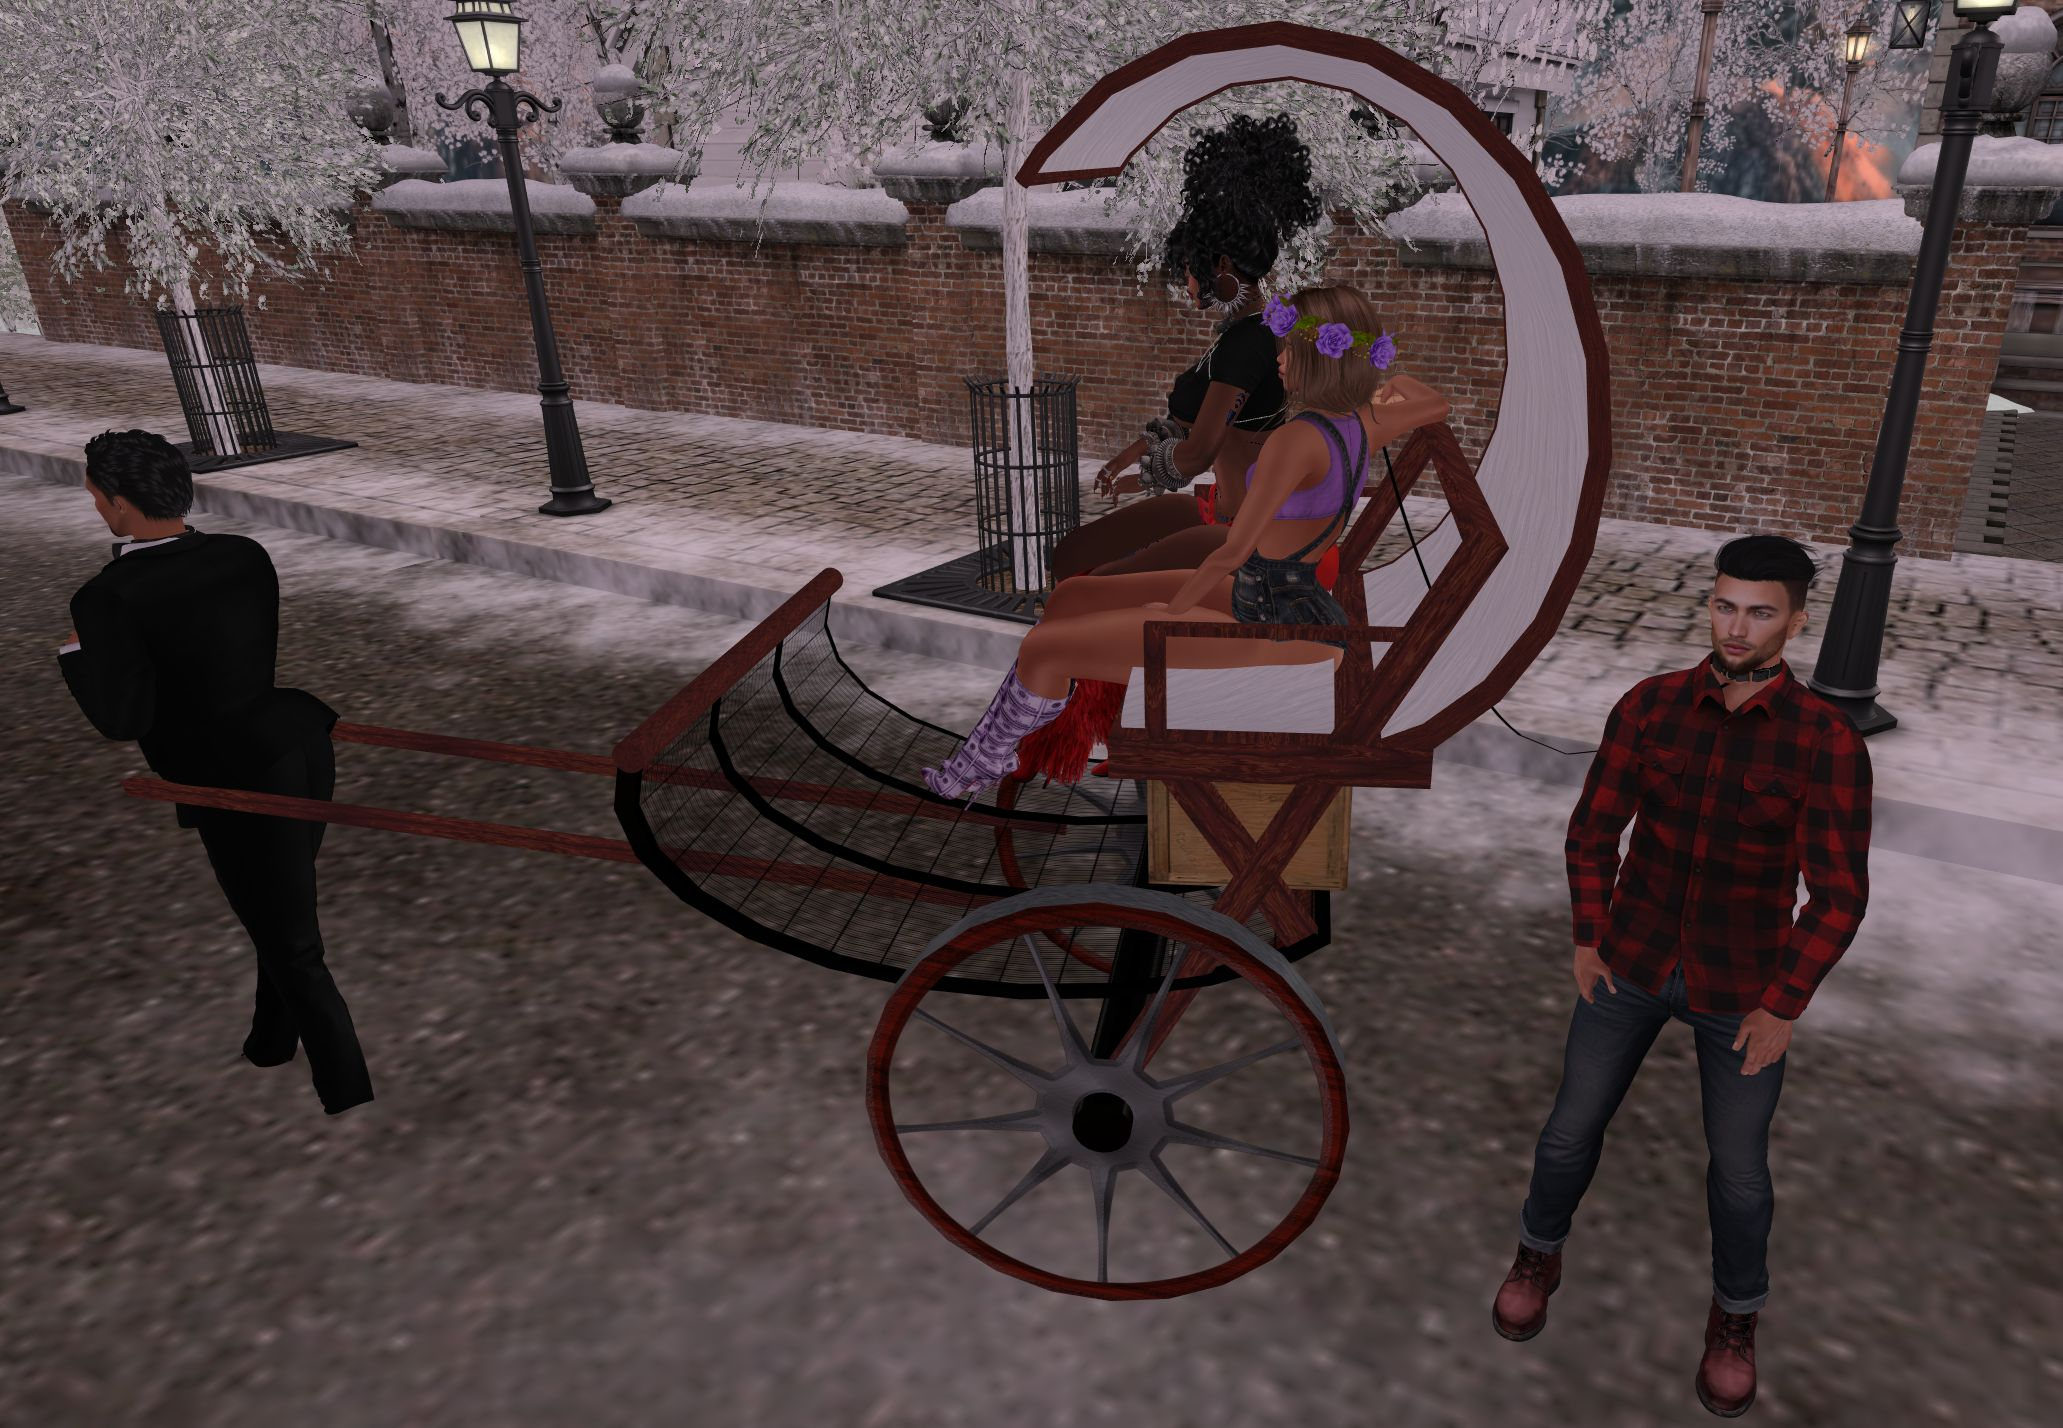 human rickshaw objectification